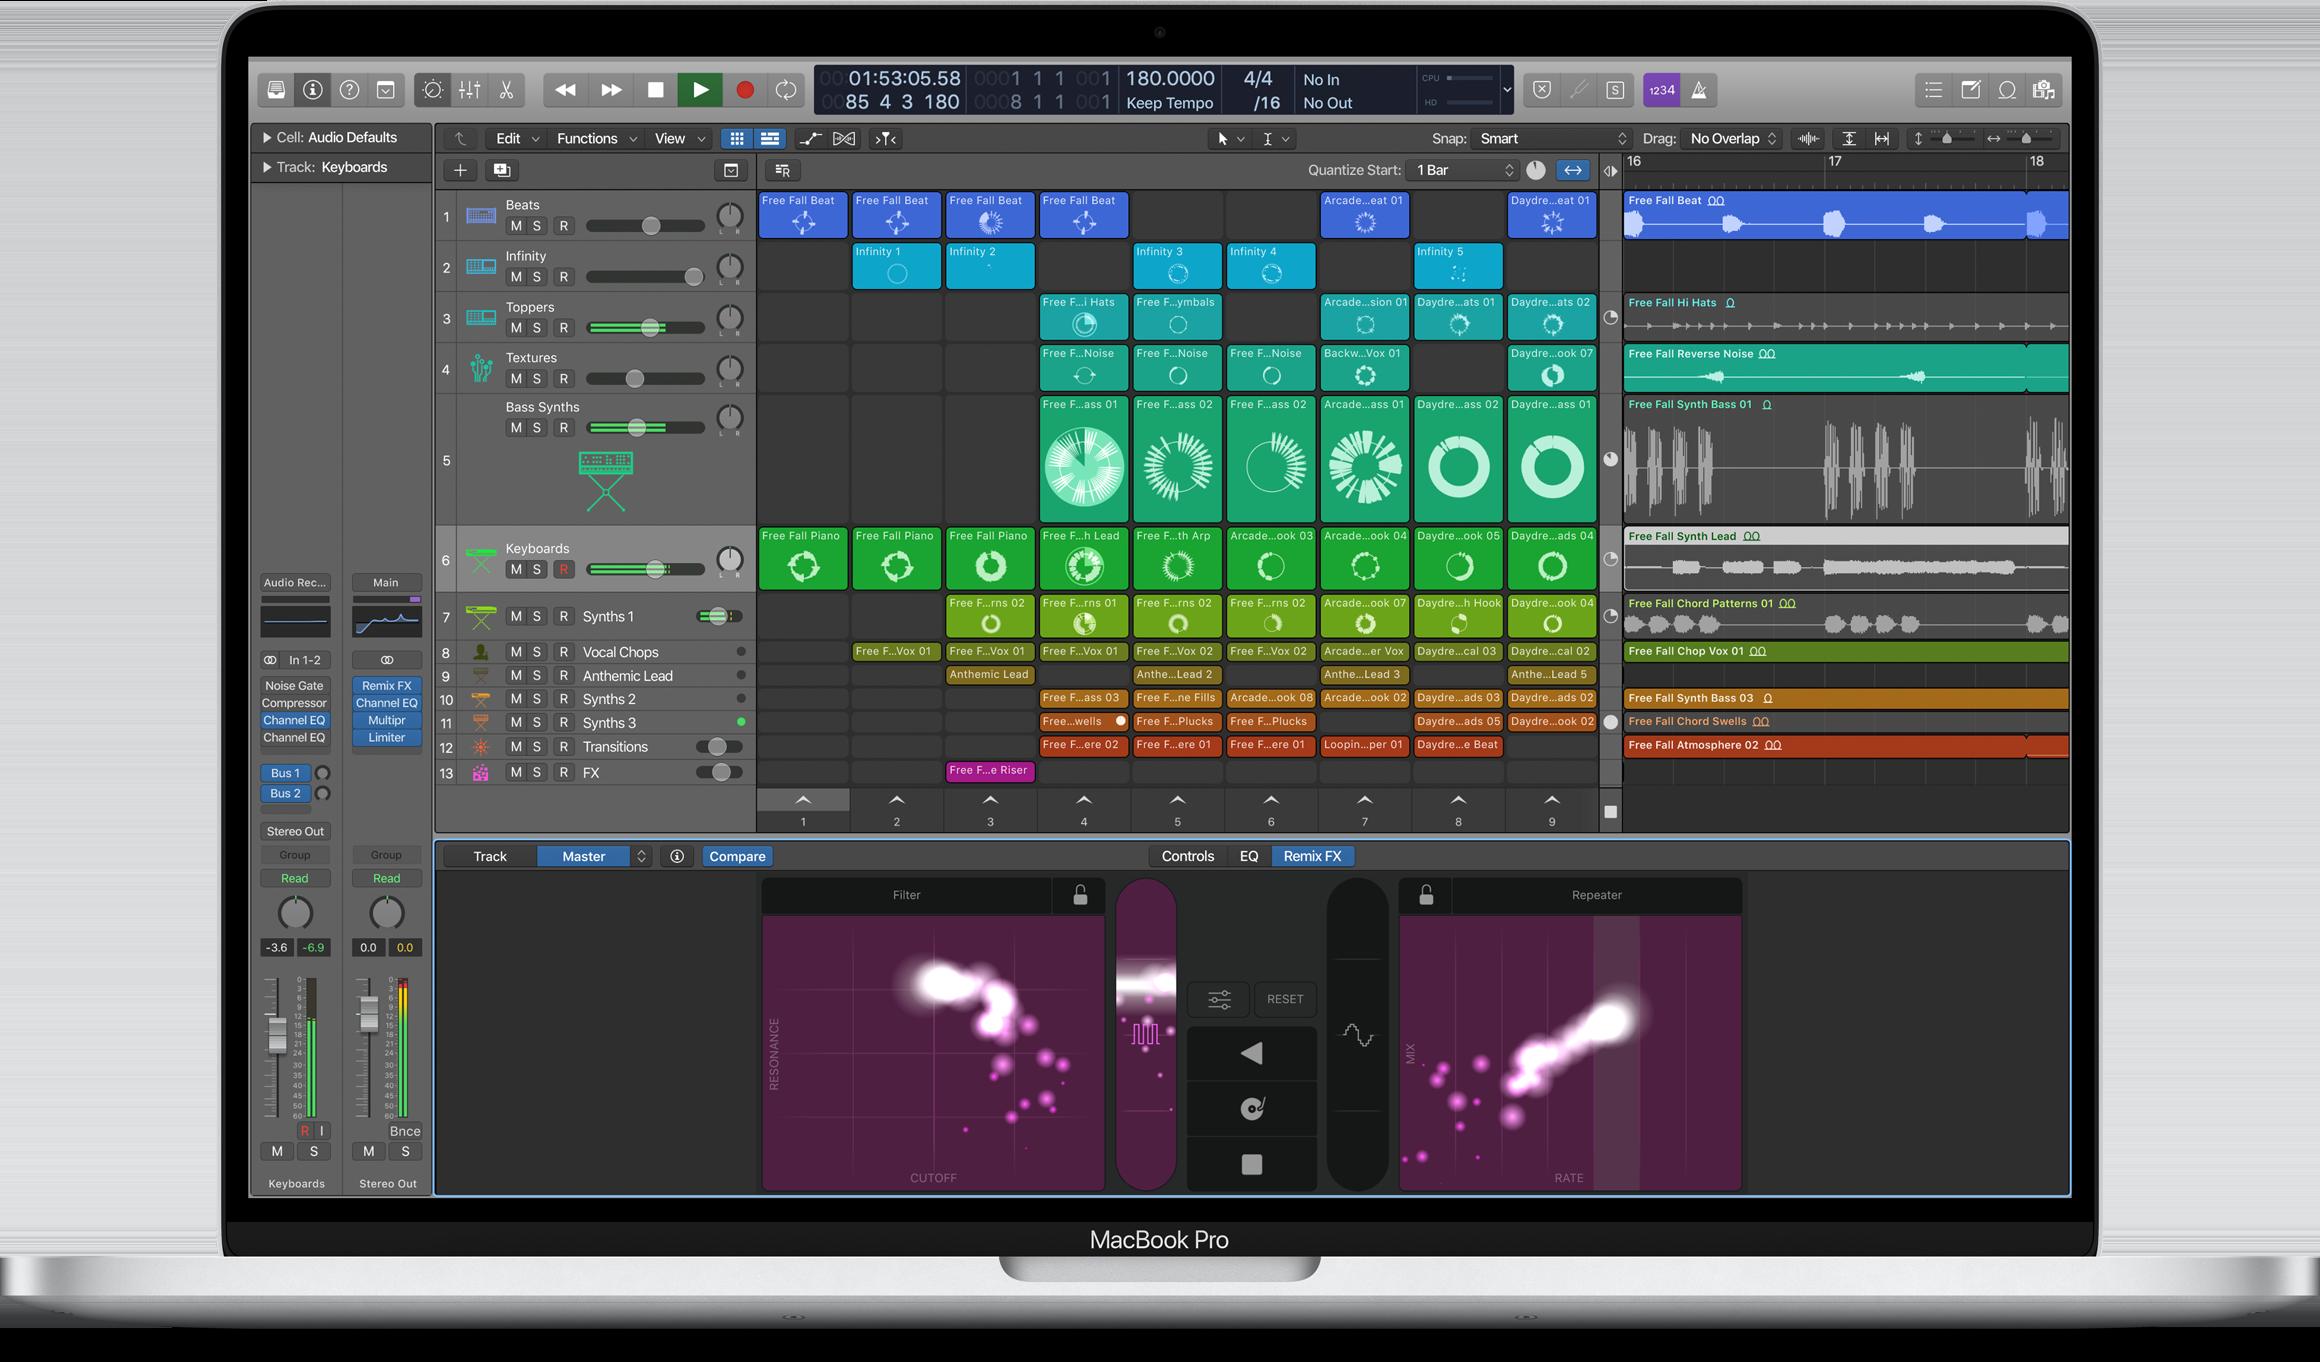 Ableton Live 10 Macbook Pro